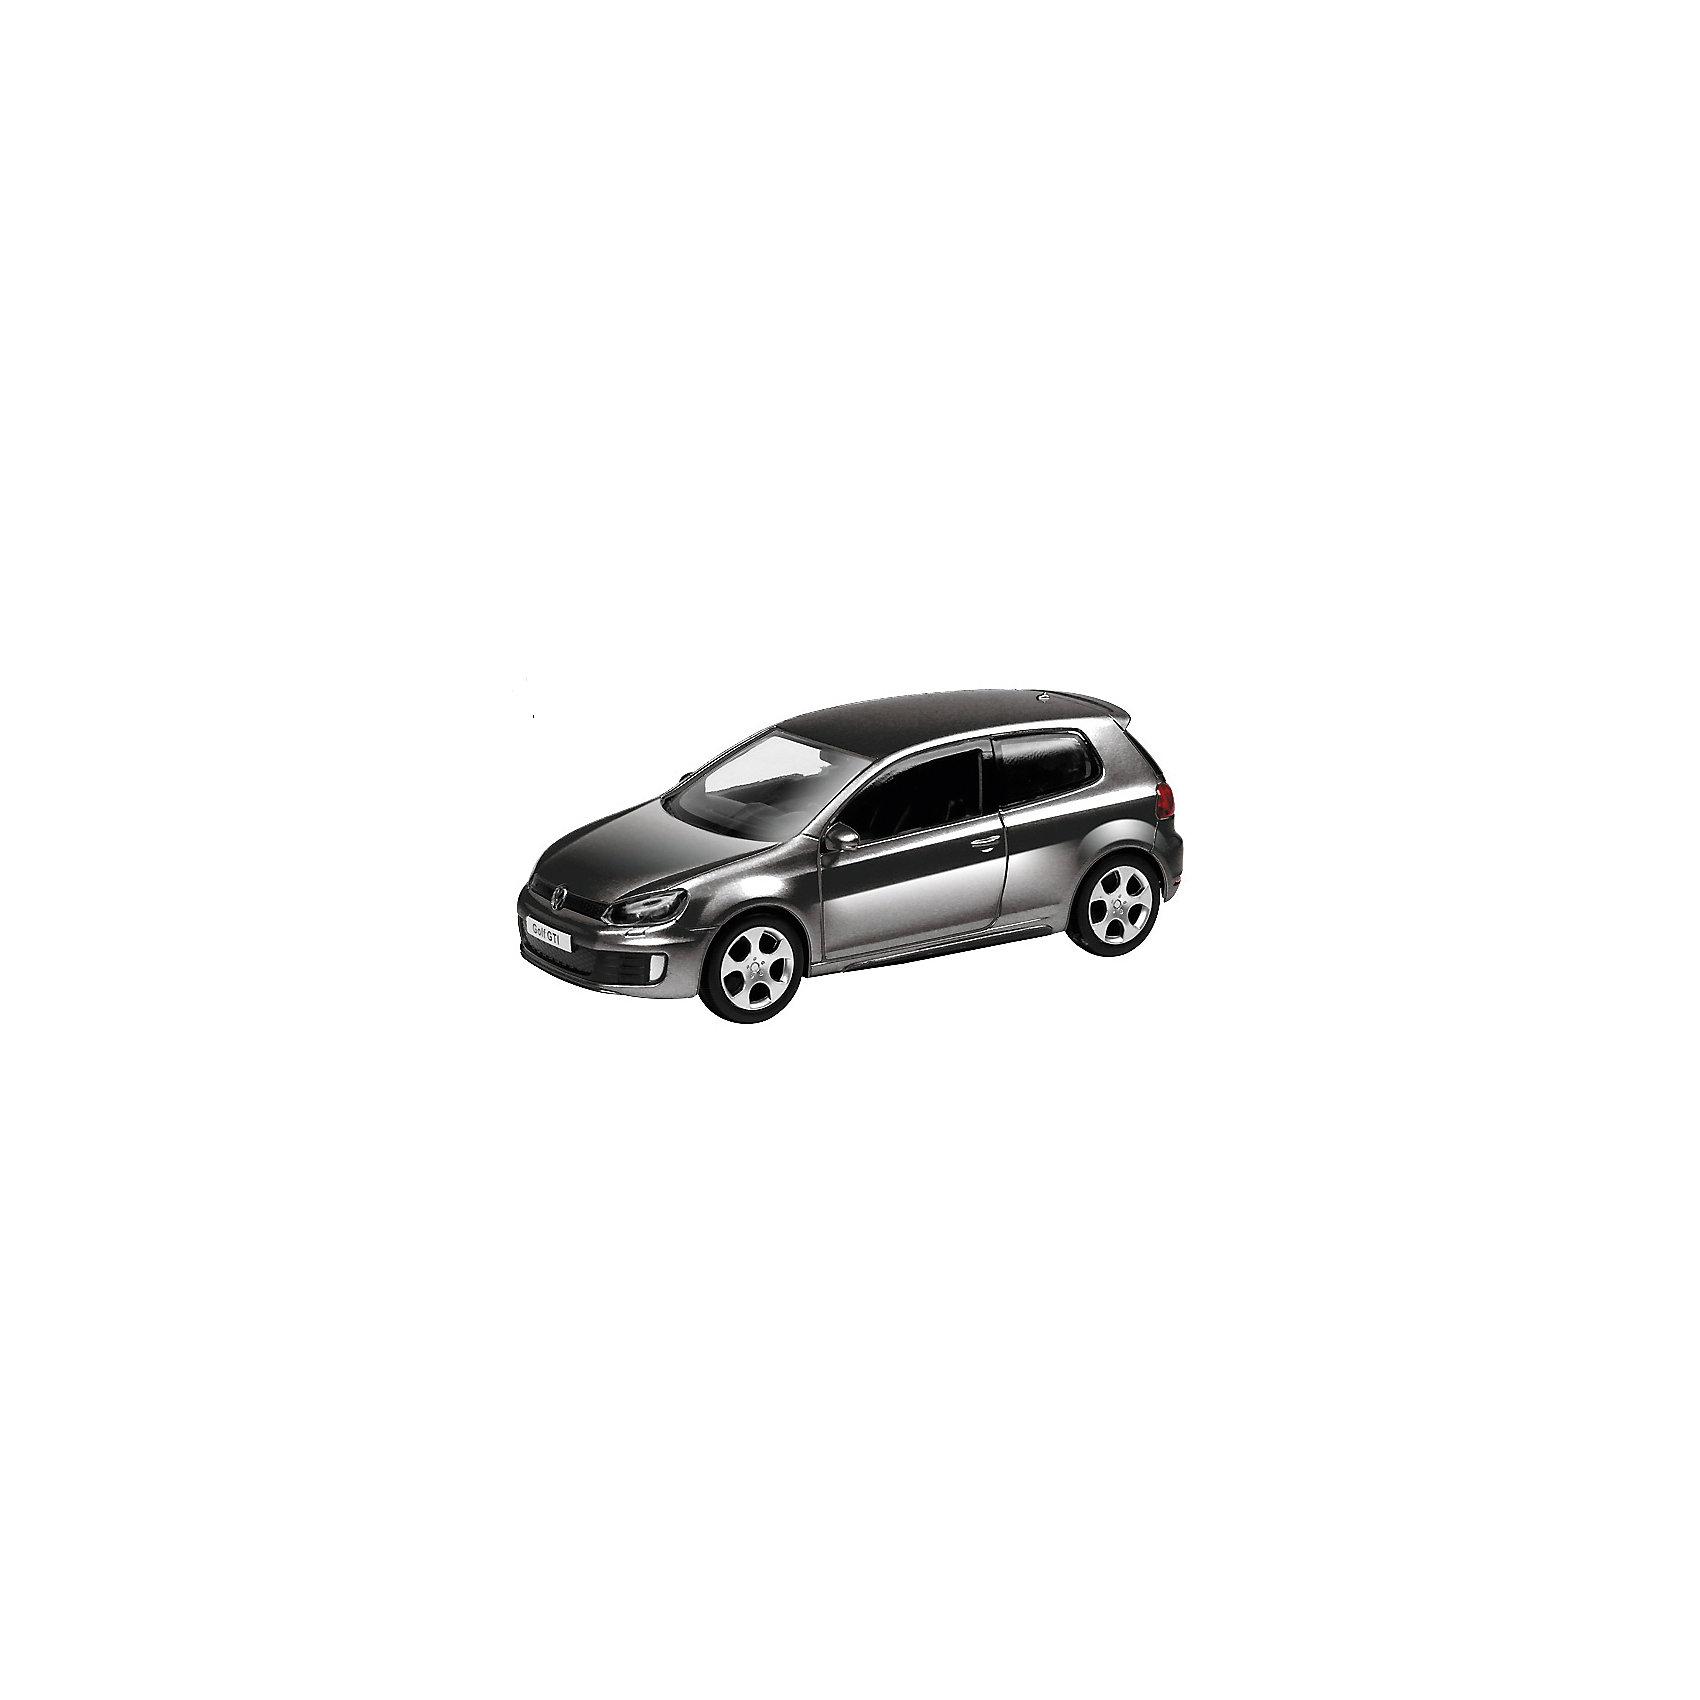 Машинка Volkswagen Golf GTI 4, AutotimeМашинки<br><br><br>Ширина мм: 165<br>Глубина мм: 57<br>Высота мм: 75<br>Вес г: 13<br>Возраст от месяцев: 36<br>Возраст до месяцев: 2147483647<br>Пол: Мужской<br>Возраст: Детский<br>SKU: 5584095